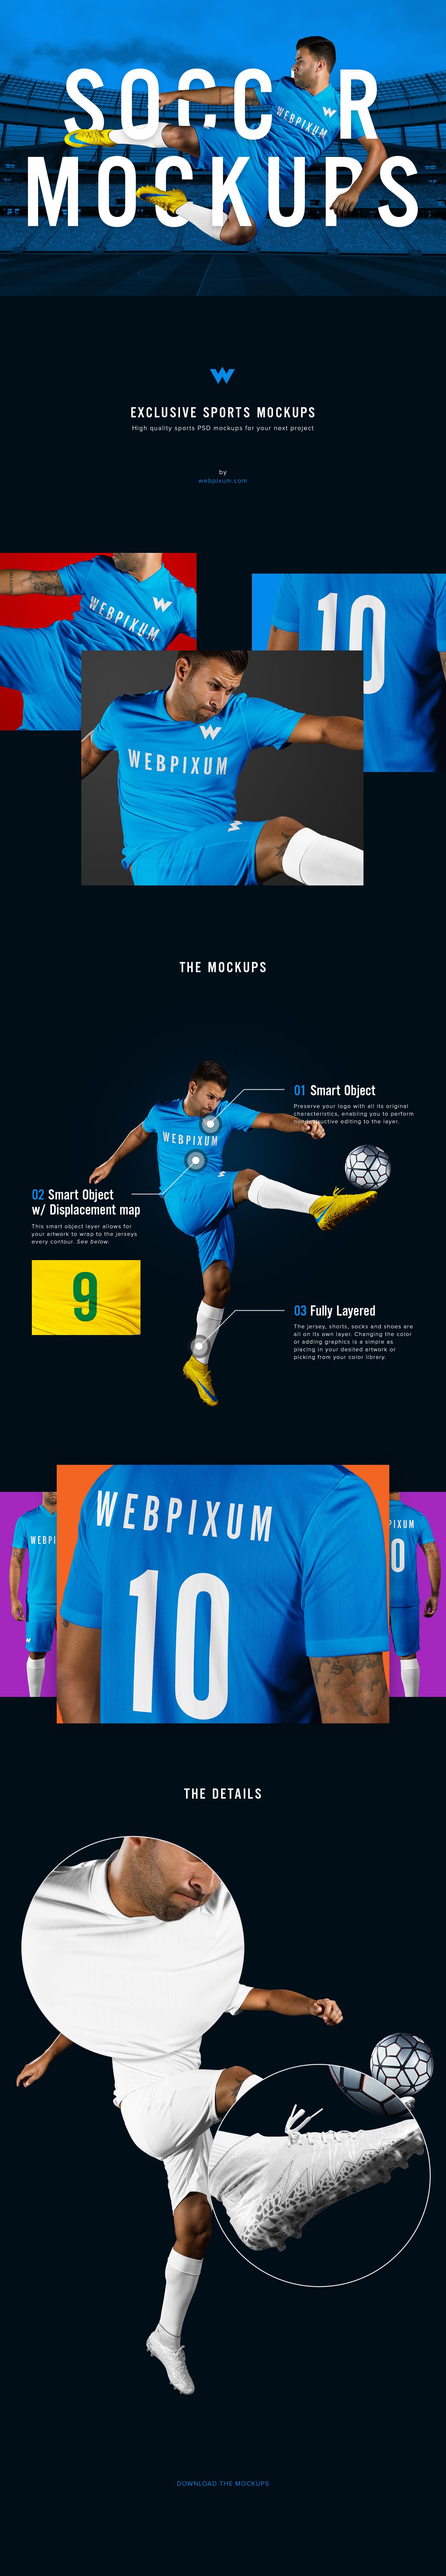 Soccer Kit Mockups Photorealistic High Quality